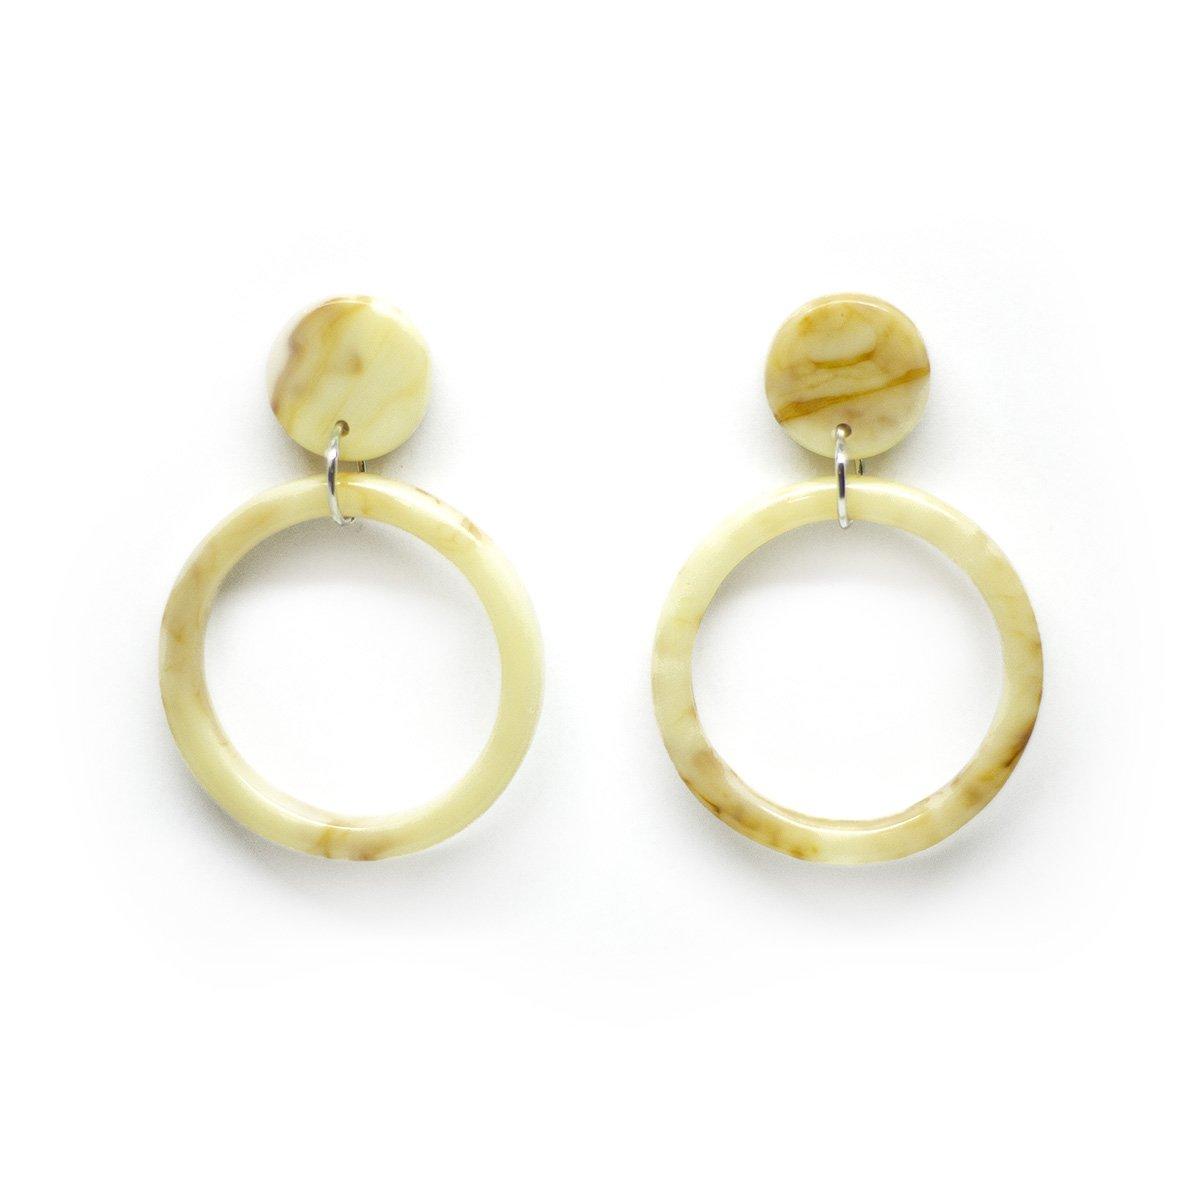 sieraden handgemaakte oorbellen verjaardagscadeau cadeau handmade earrings